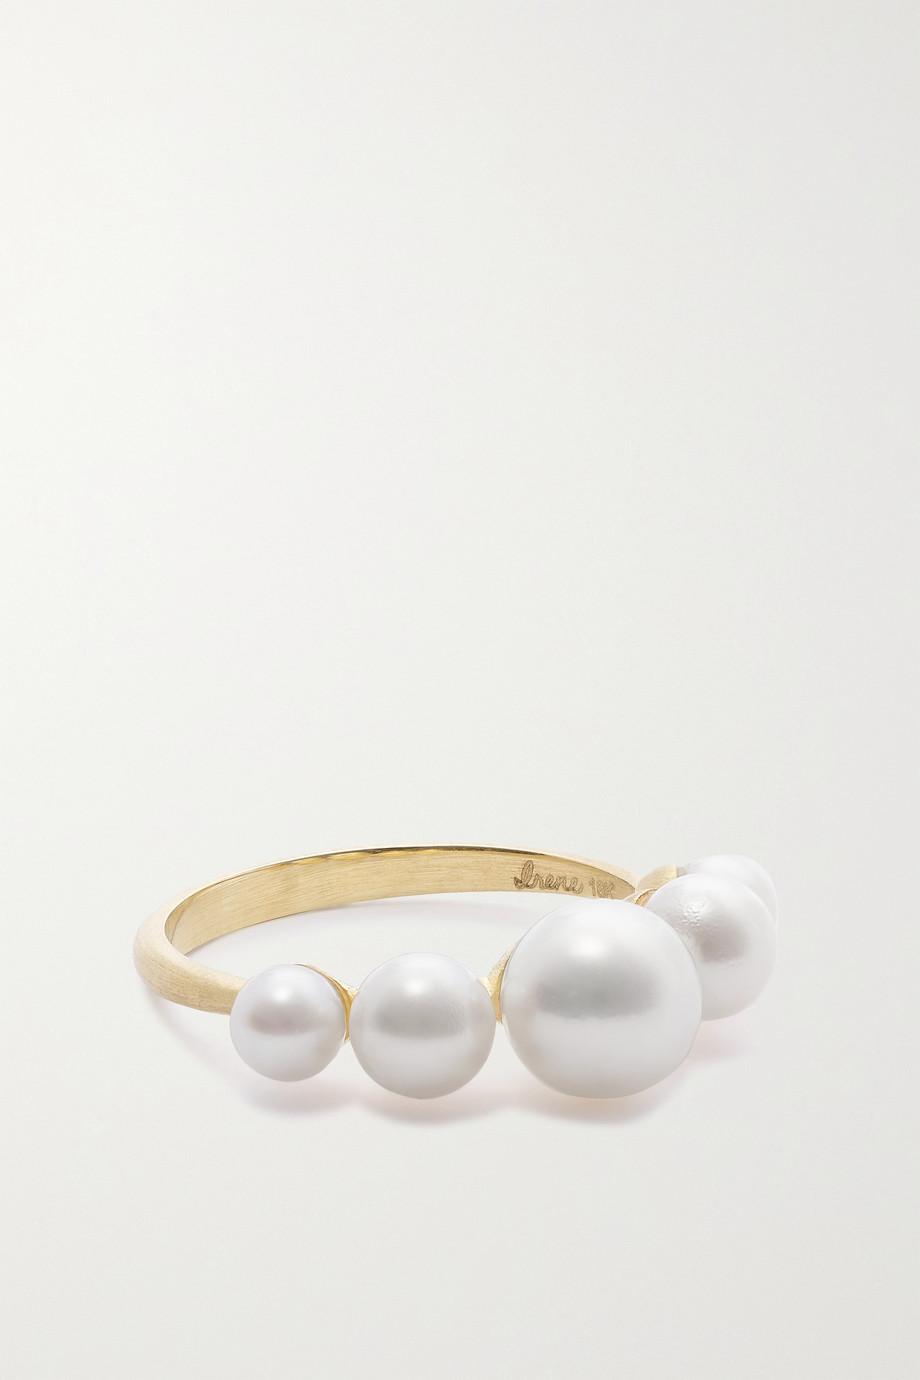 Irene Neuwirth Bague en or 18 carats (750/1000) et perles